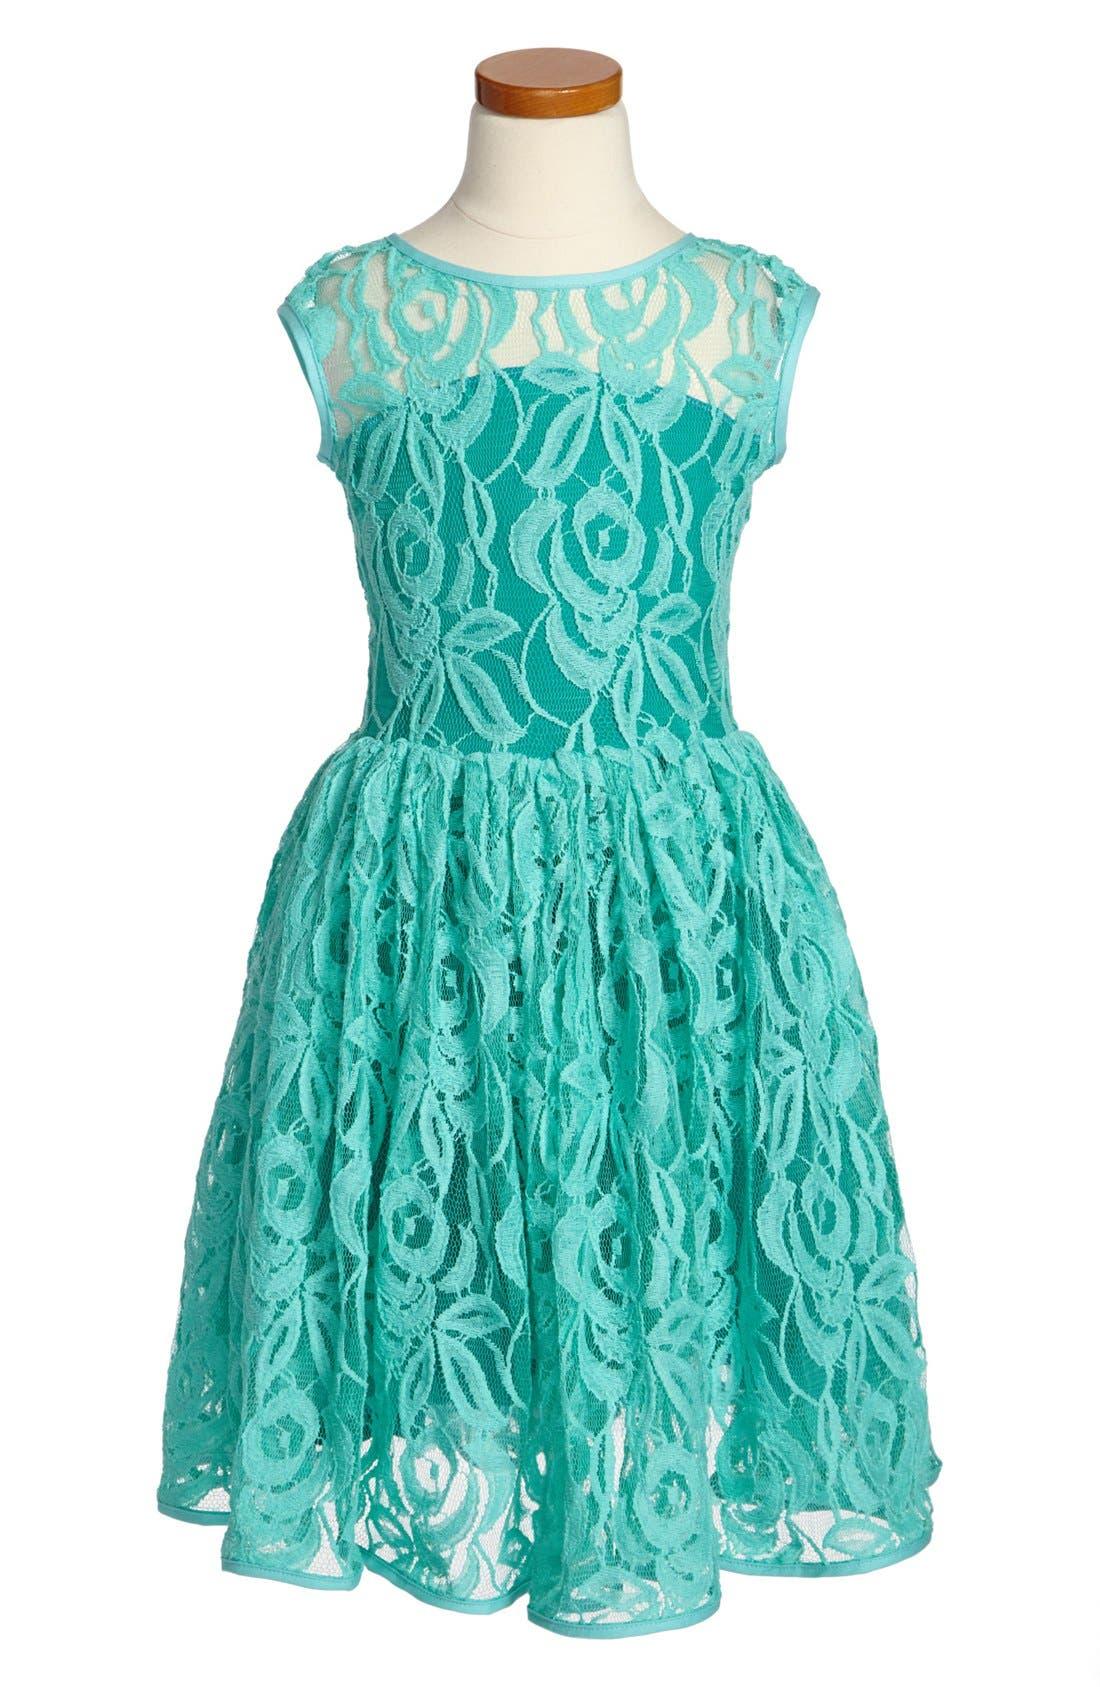 Main Image - Fiveloaves Twofish Lace Dress (Little Girls & Big Girls)